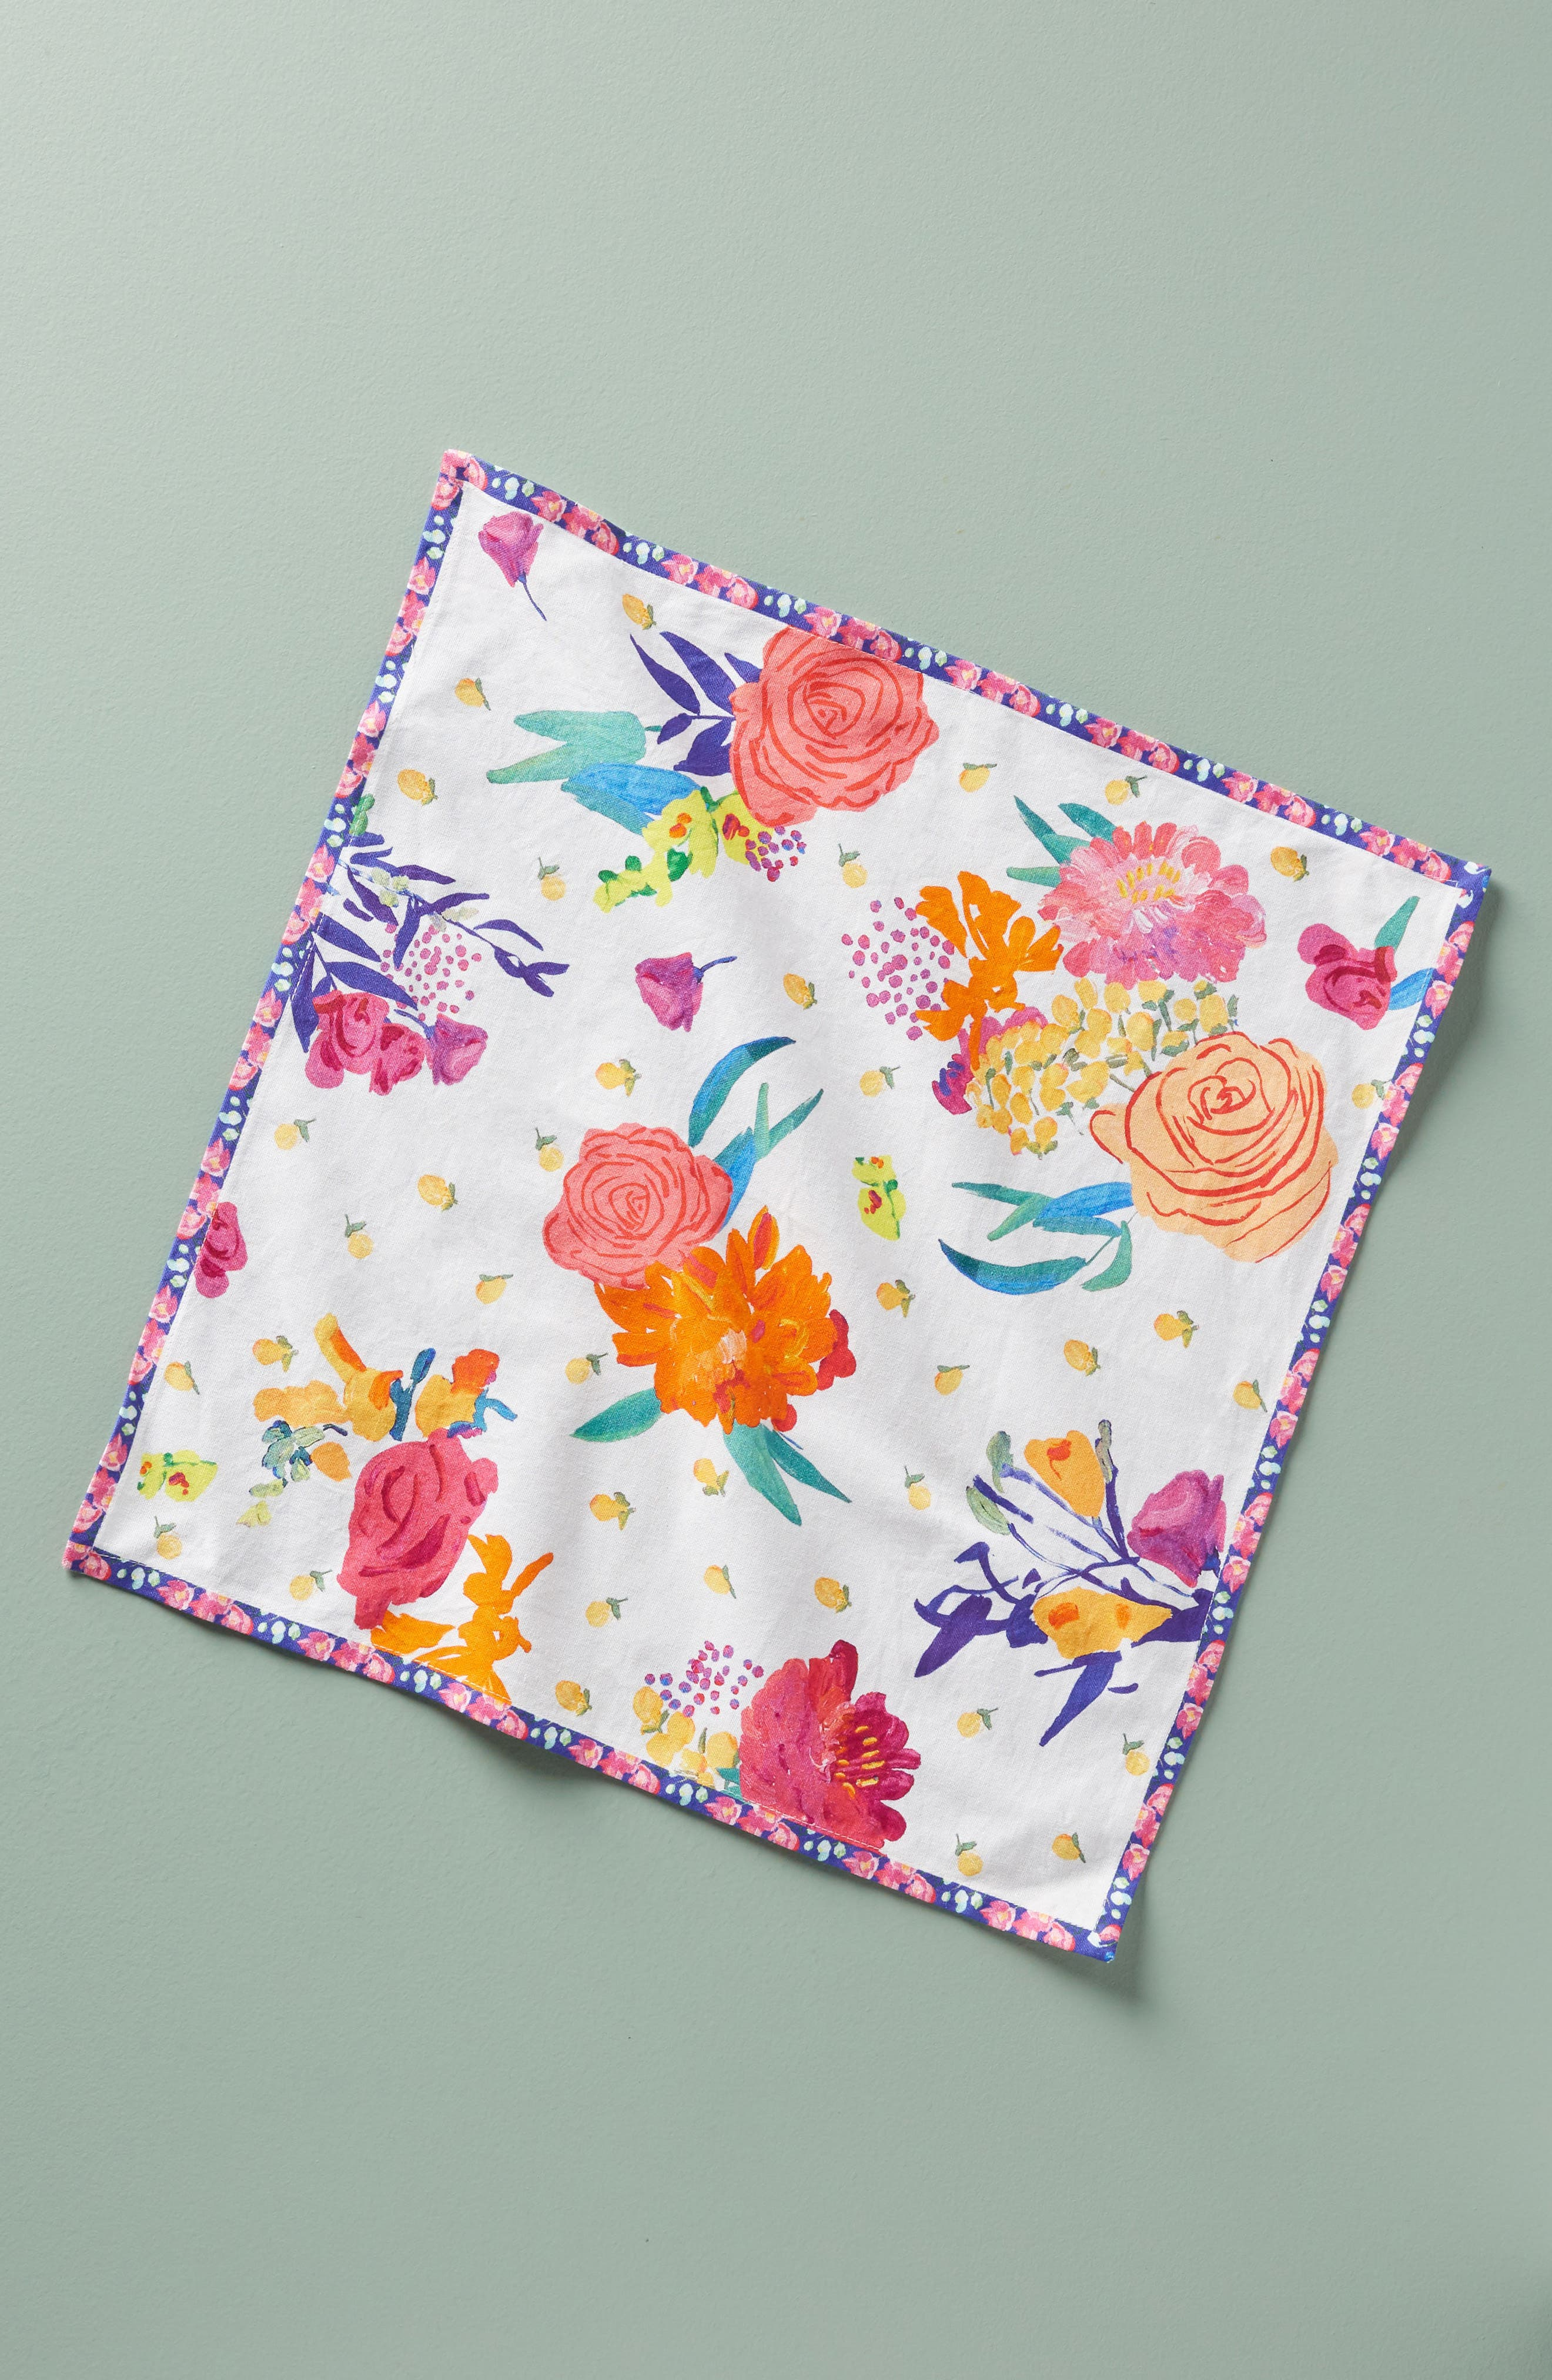 Paint + Petals Napkin,                         Main,                         color,